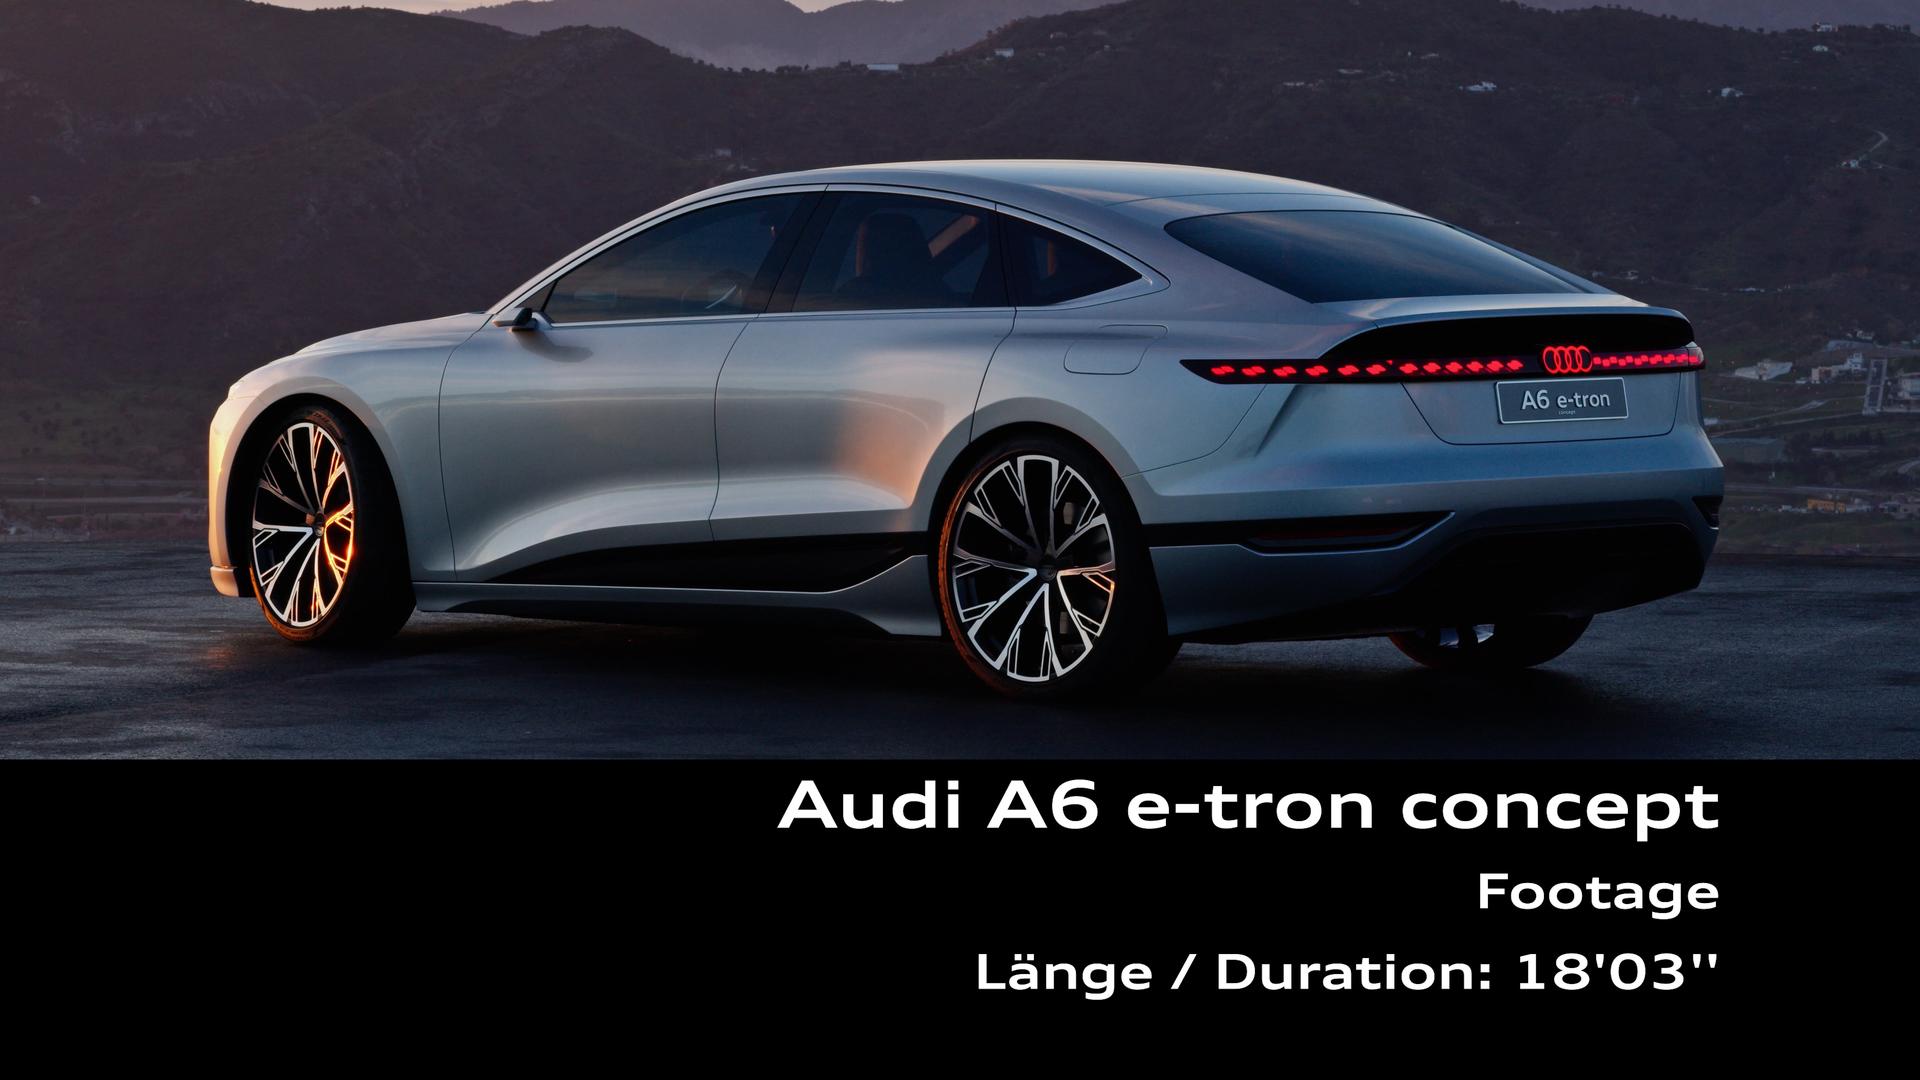 Footage: Audi A6 e-tron concept